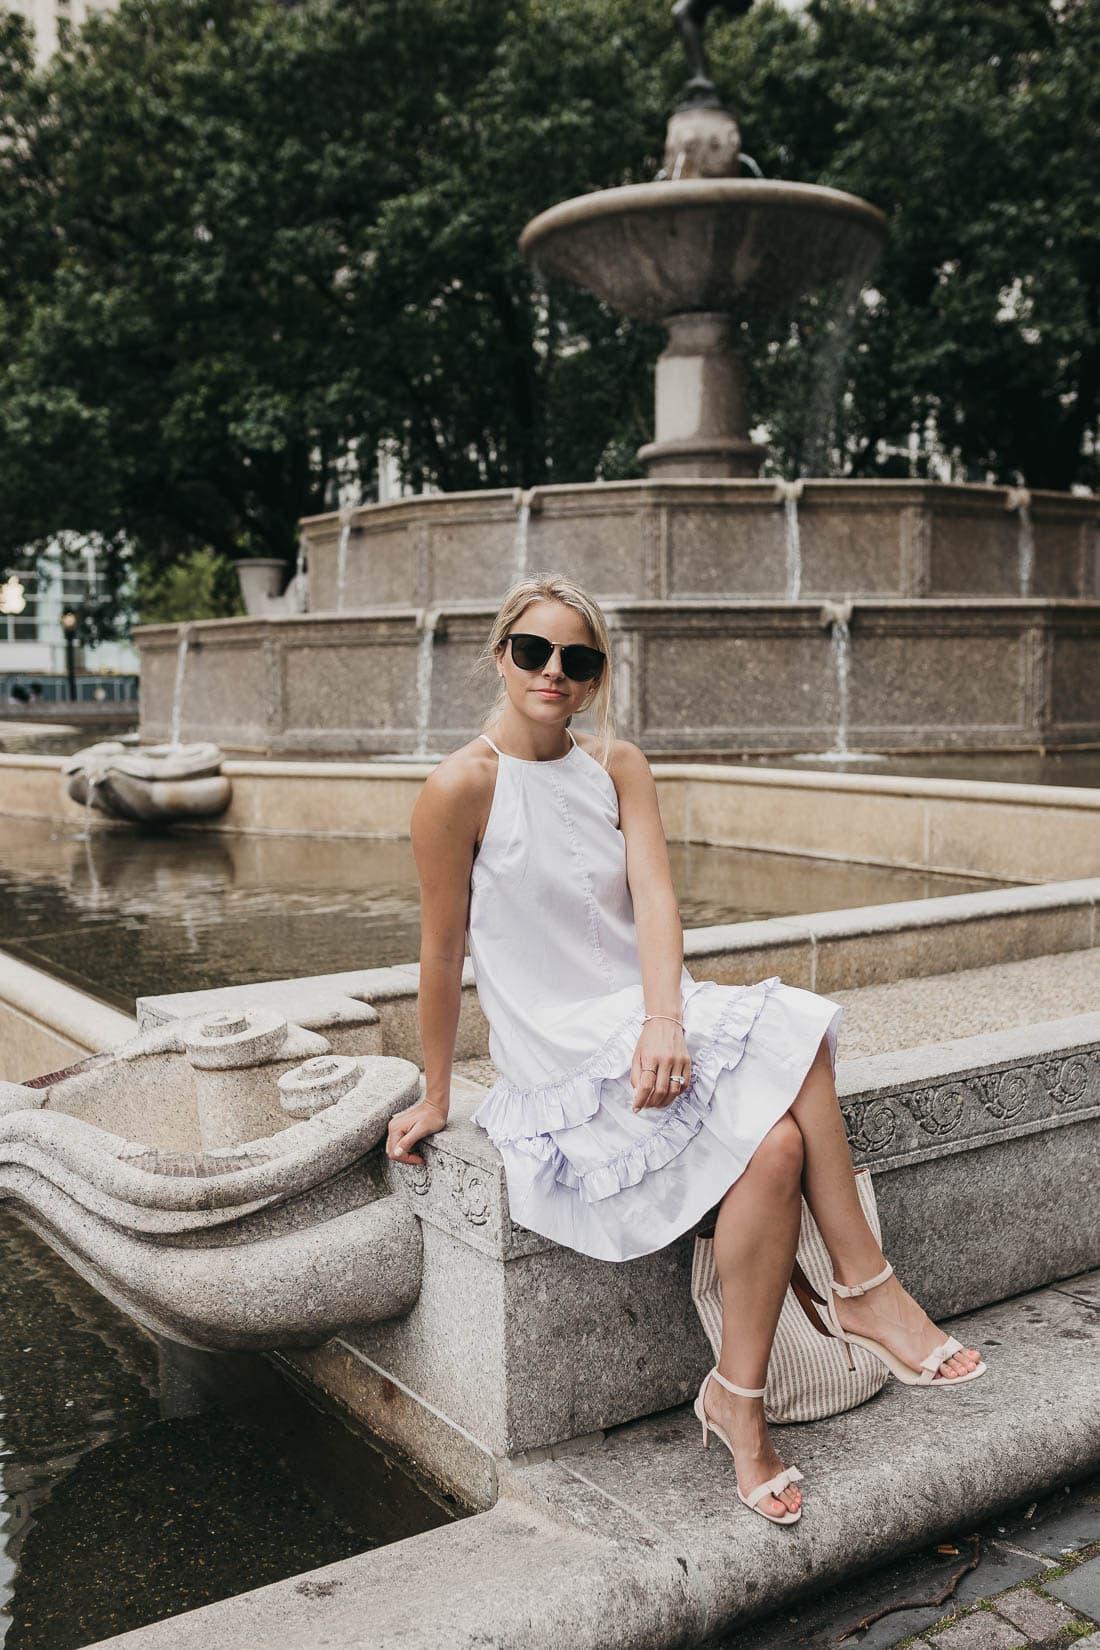 Summer in New York City